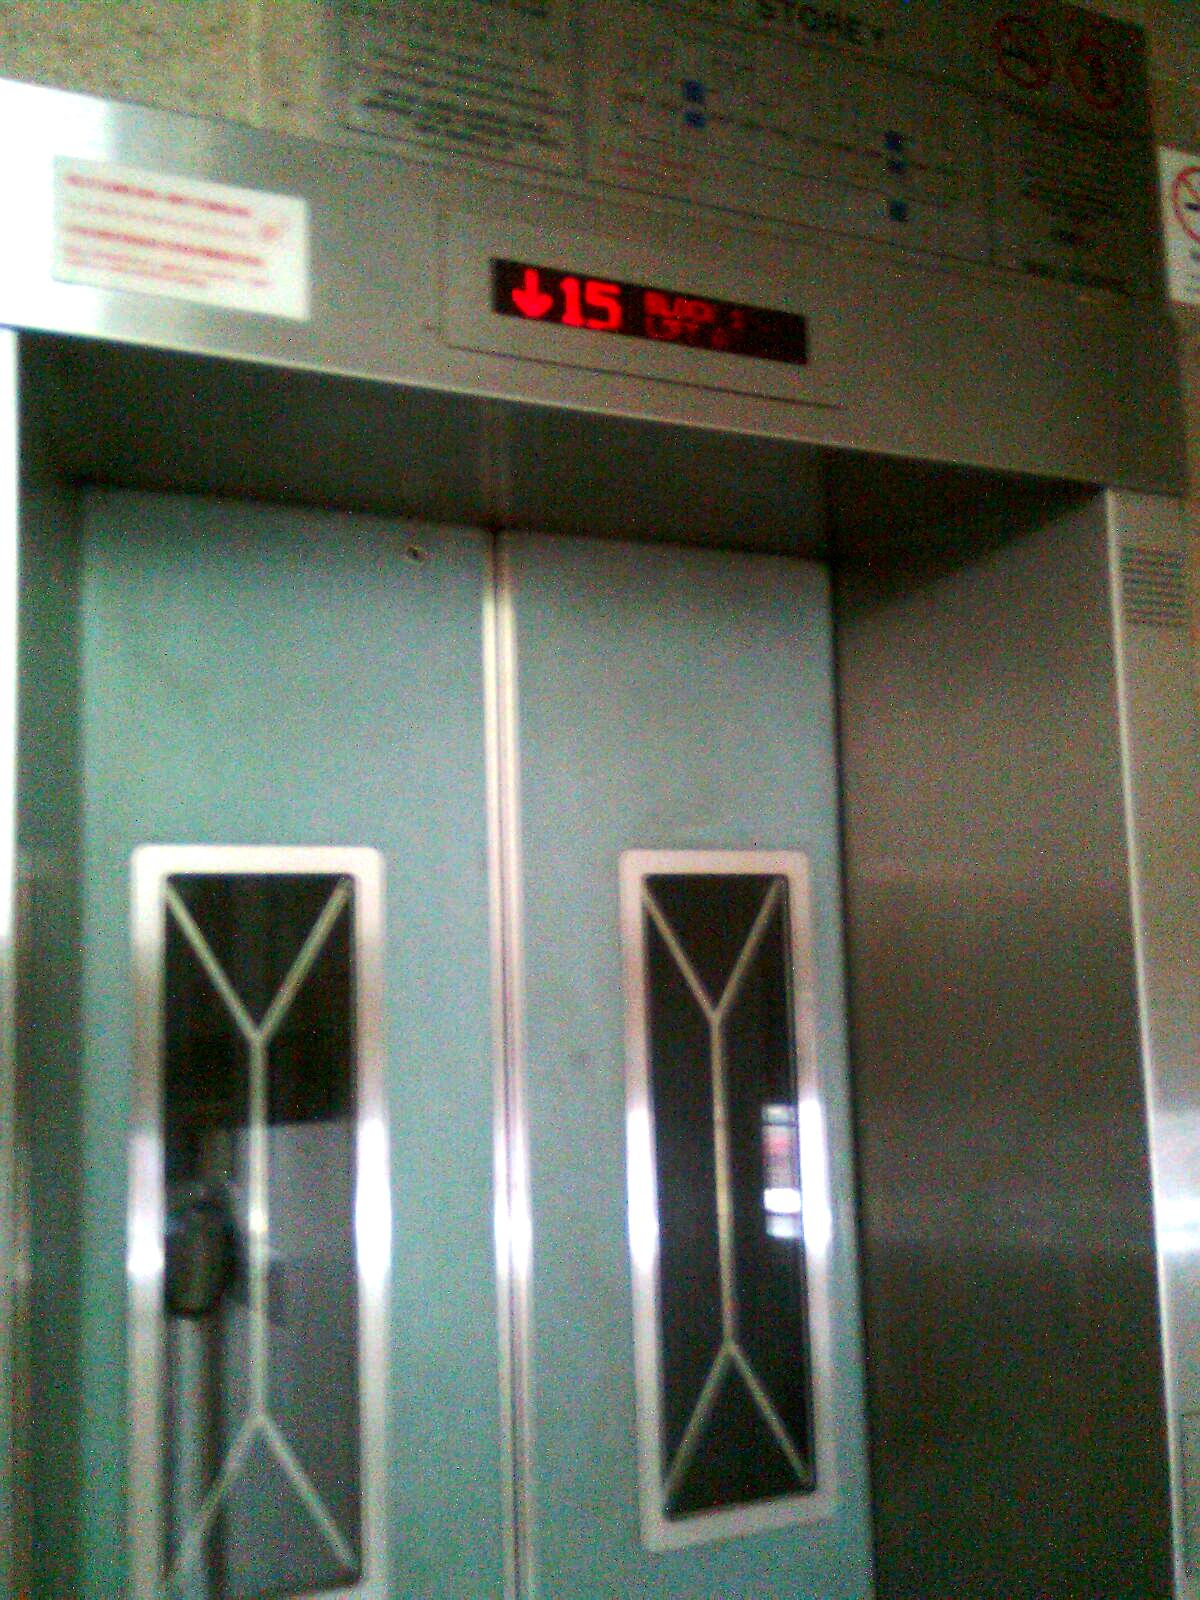 Blk. 1 Beach Road - OTIS Elevator (Lift A).jpg. Image Number 49 Of Hydraulic Doors Wiki . & Collapsible Doors Wikipedia u0026 Door Wiki Door U2013 Wikipedia Xtras ... pezcame.com